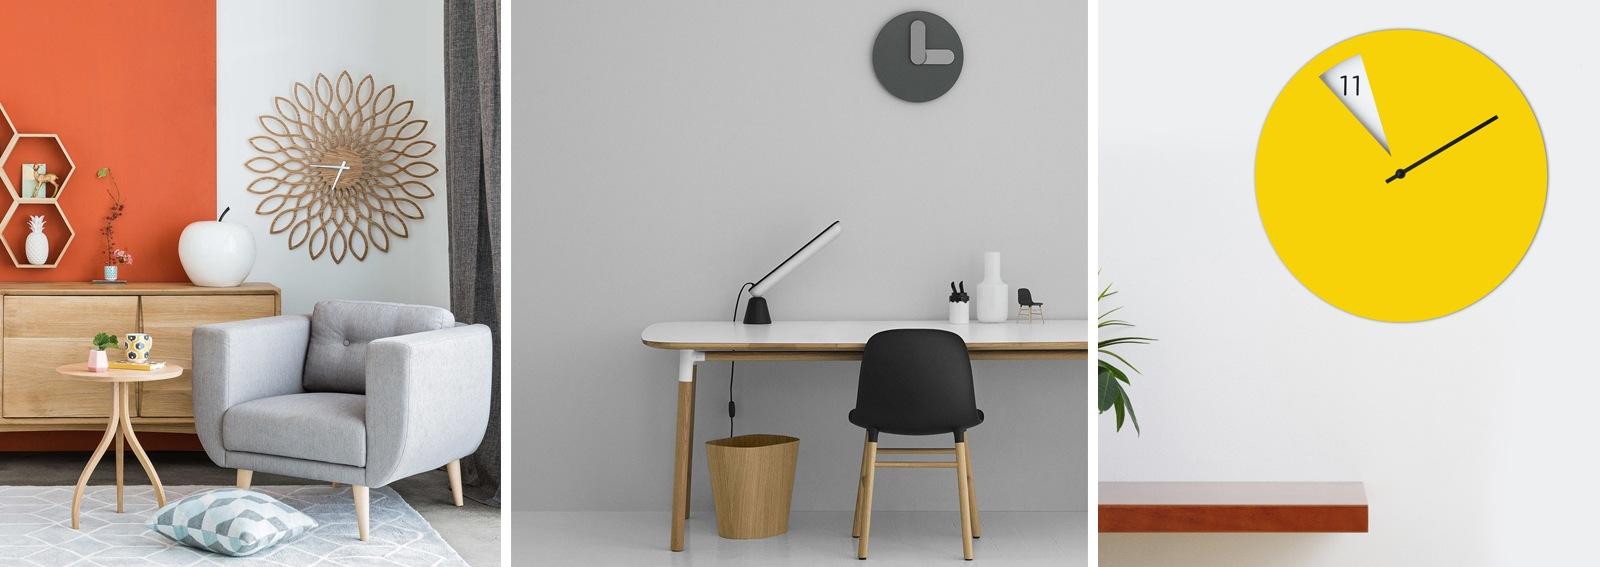 Orologi da parete forme particolari orologio da parete for Orologi parete particolari